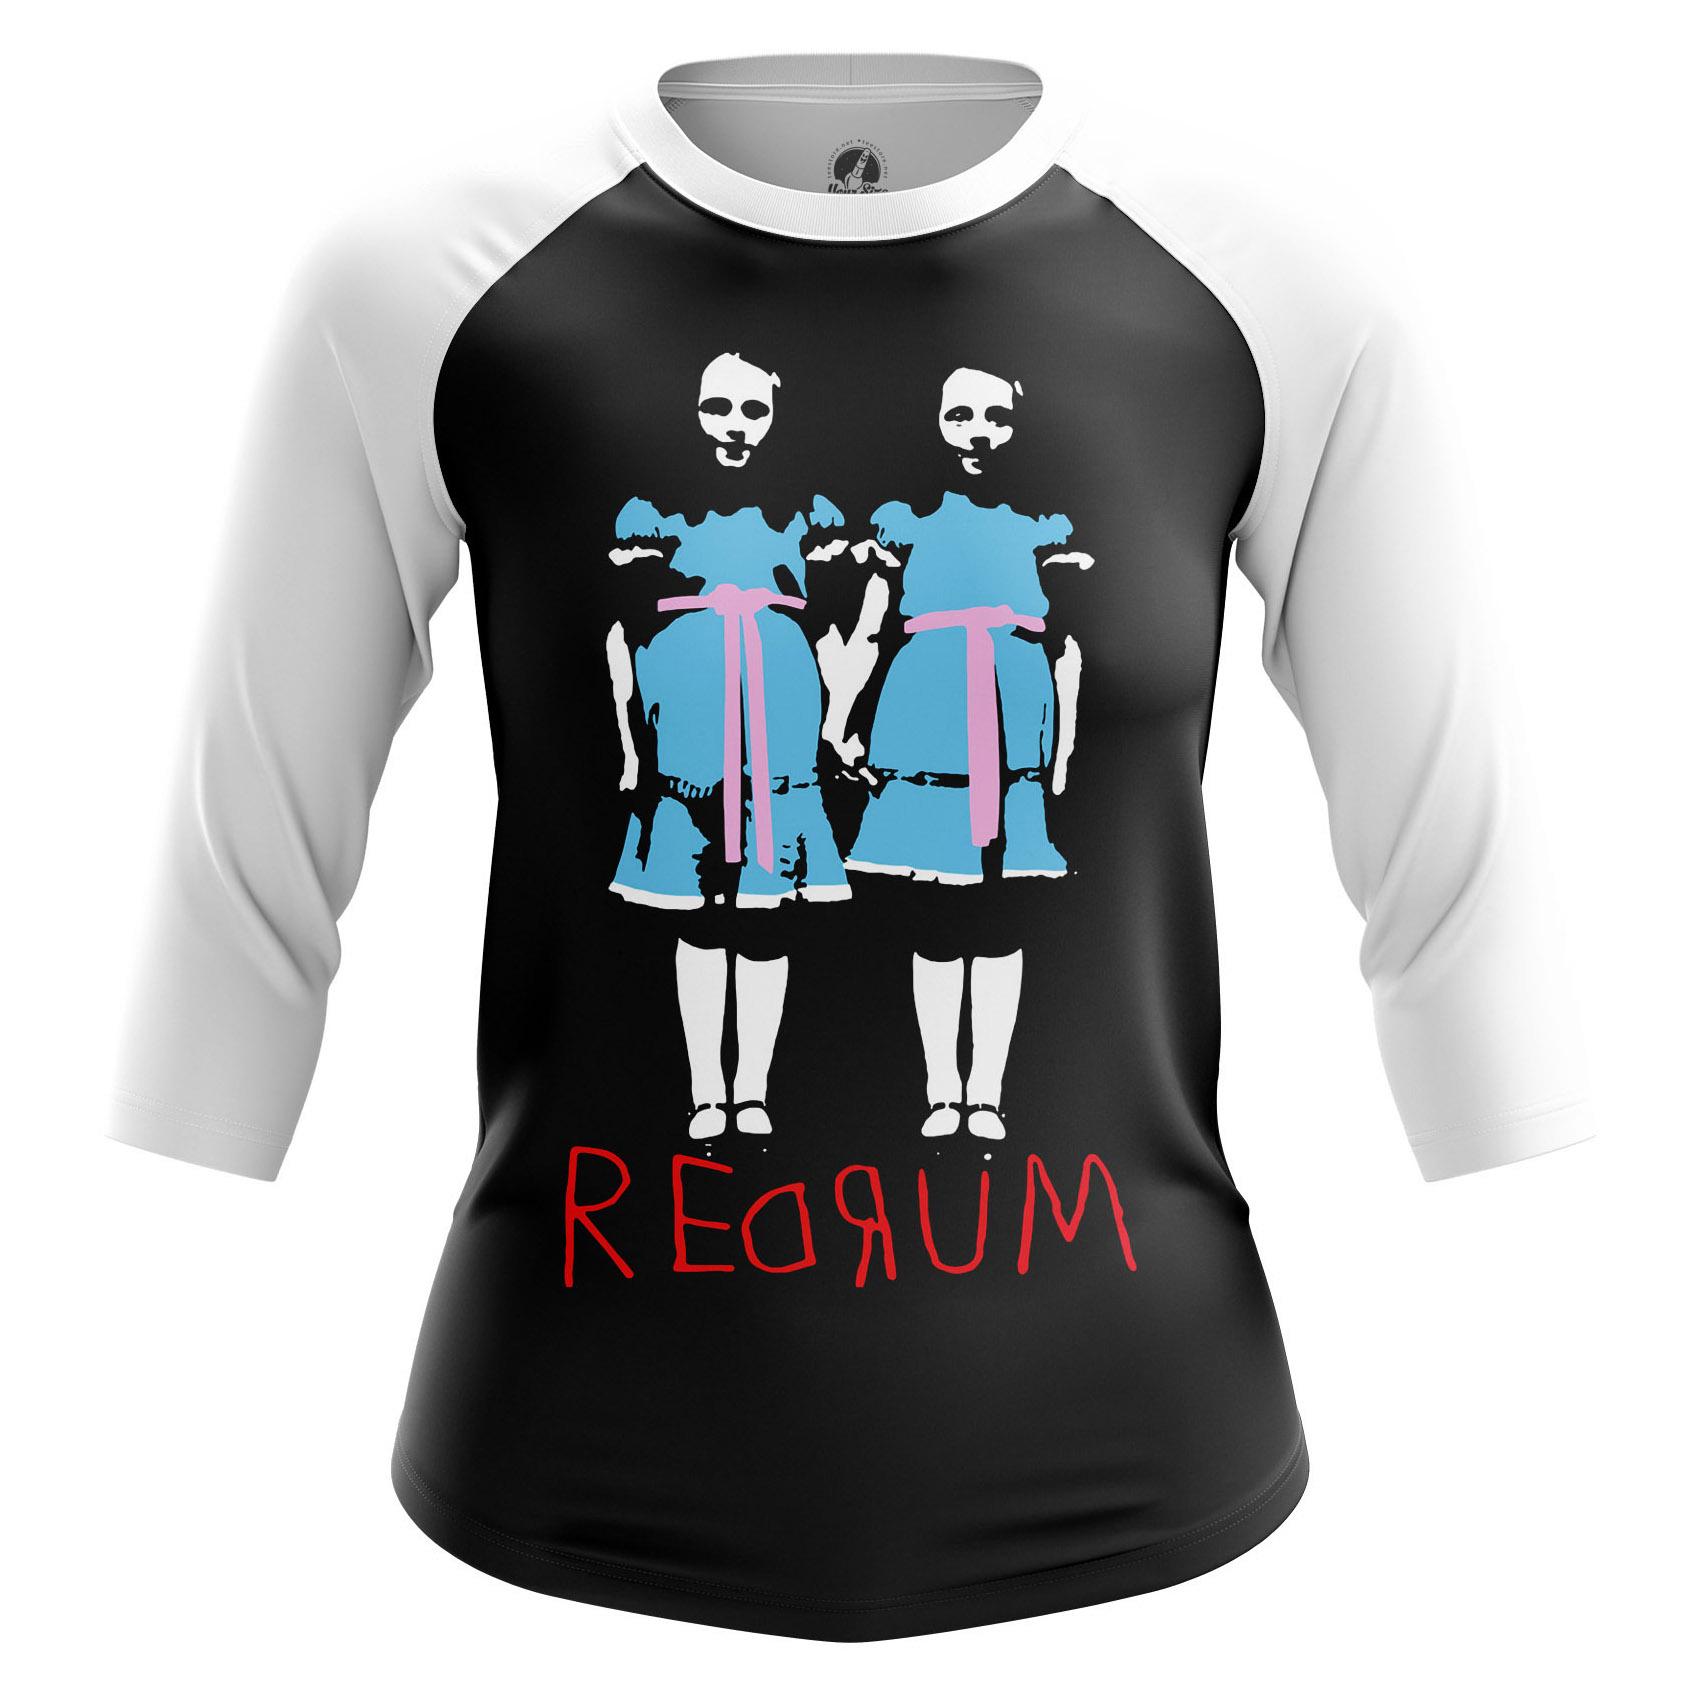 W-Rag-Redrum_1482275411_508